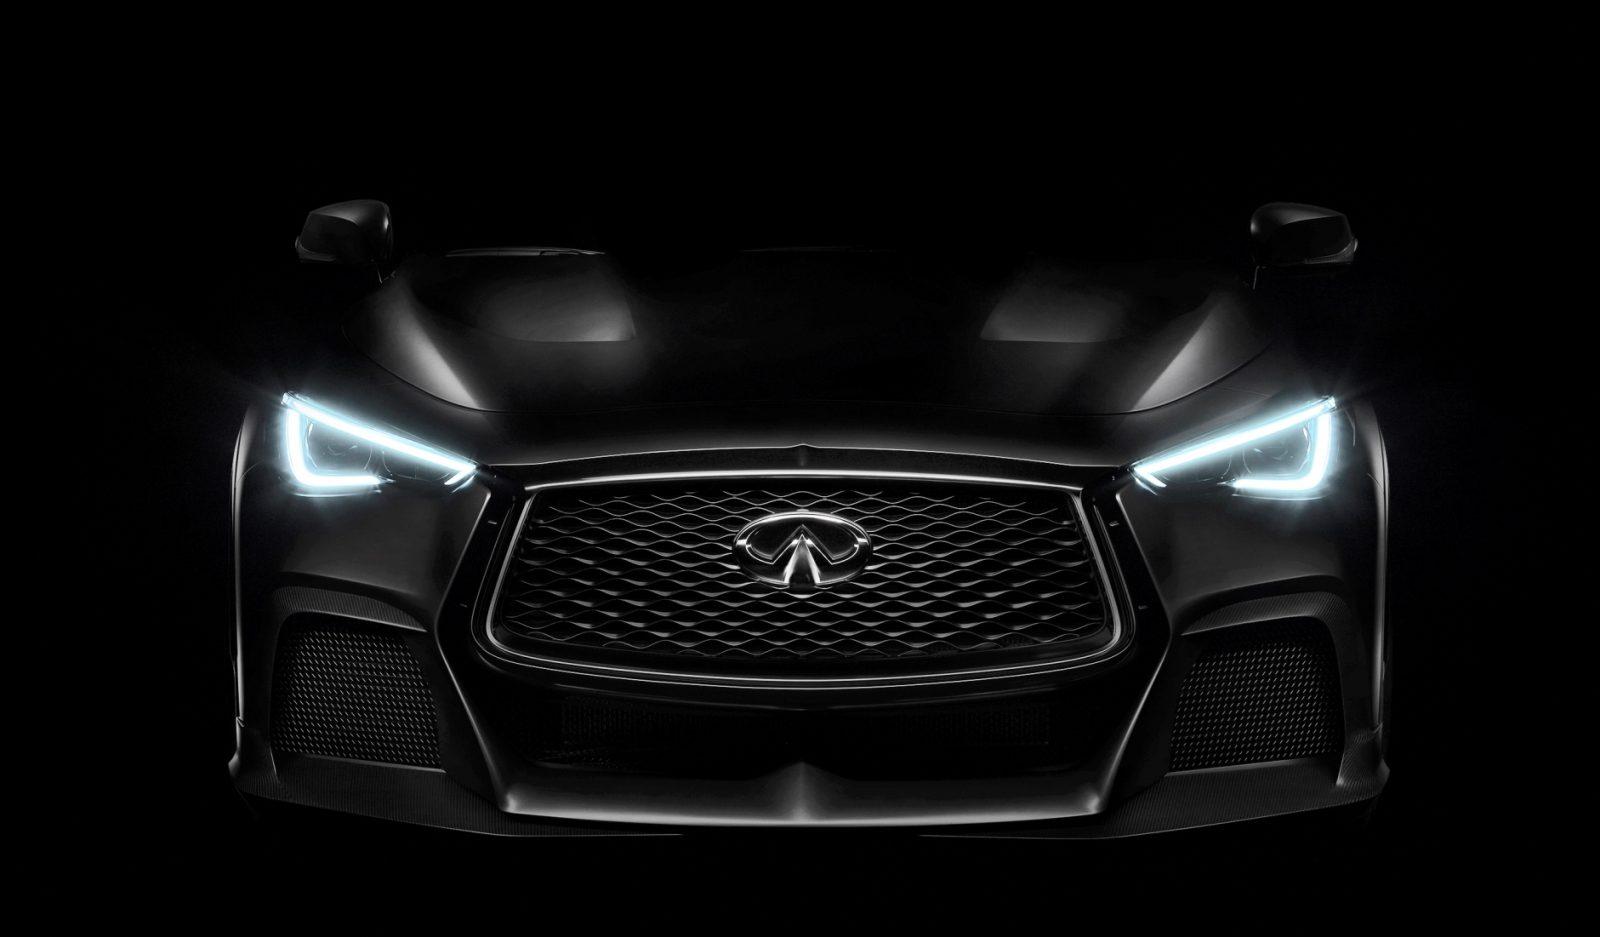 Infiniti Car Logo Wallpaper 2017 Infiniti Q60 Black S Concept 187 Best Of 2017 Awards